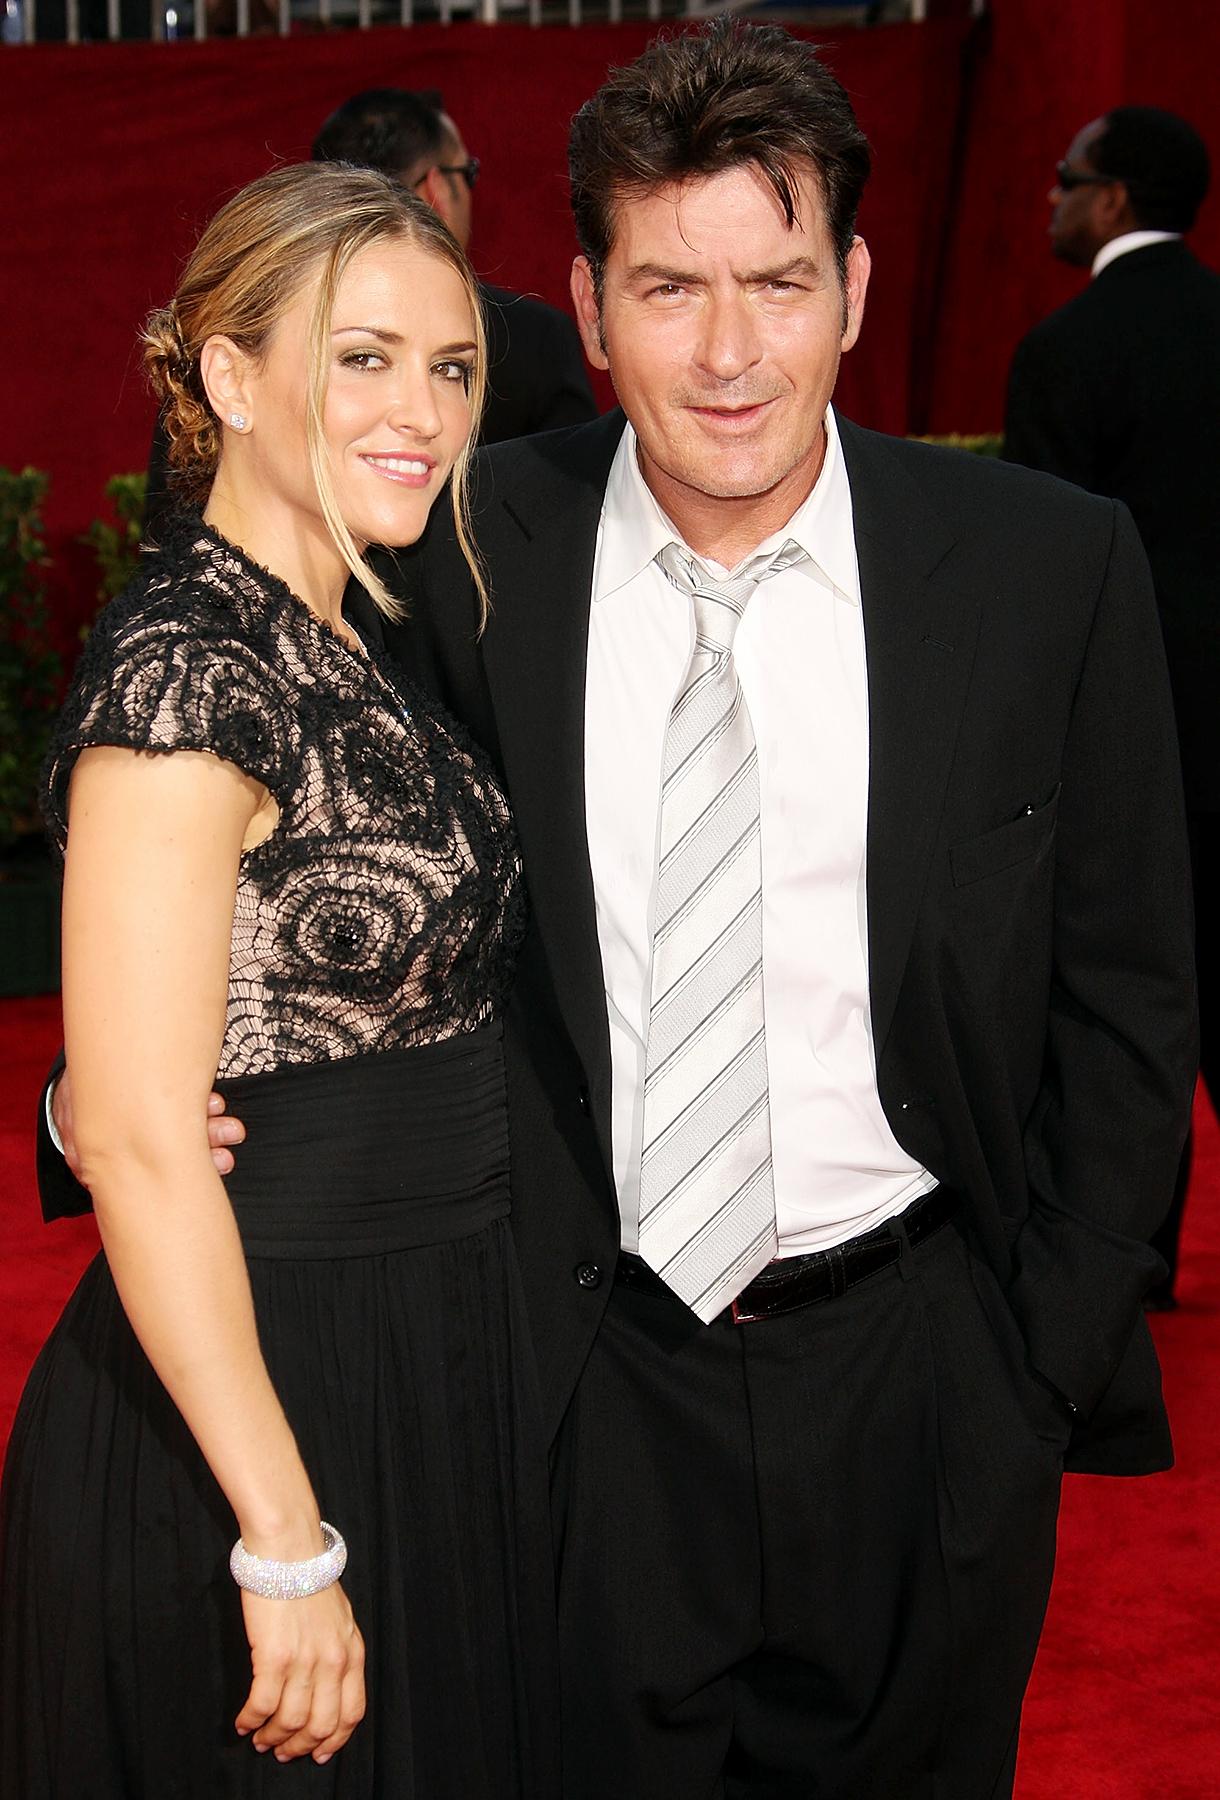 Charlie Sheens Sons Found Safe With Ex Brooke Mueller